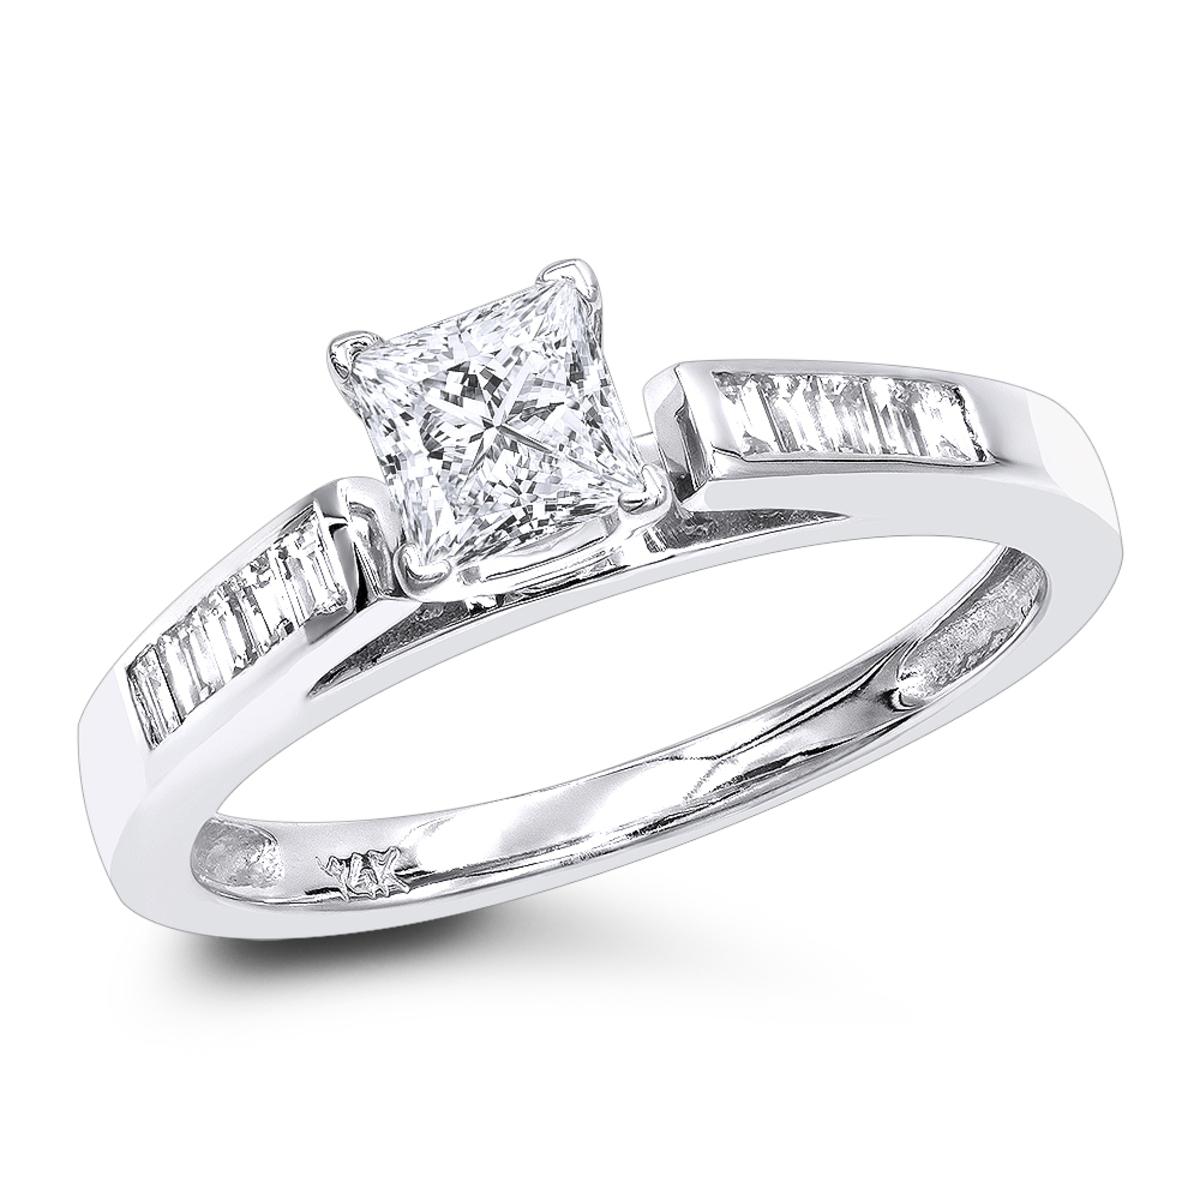 Cheap Engagement Rings 0.75ct Princess Cut Diamond Engagement Ring 14k Gold